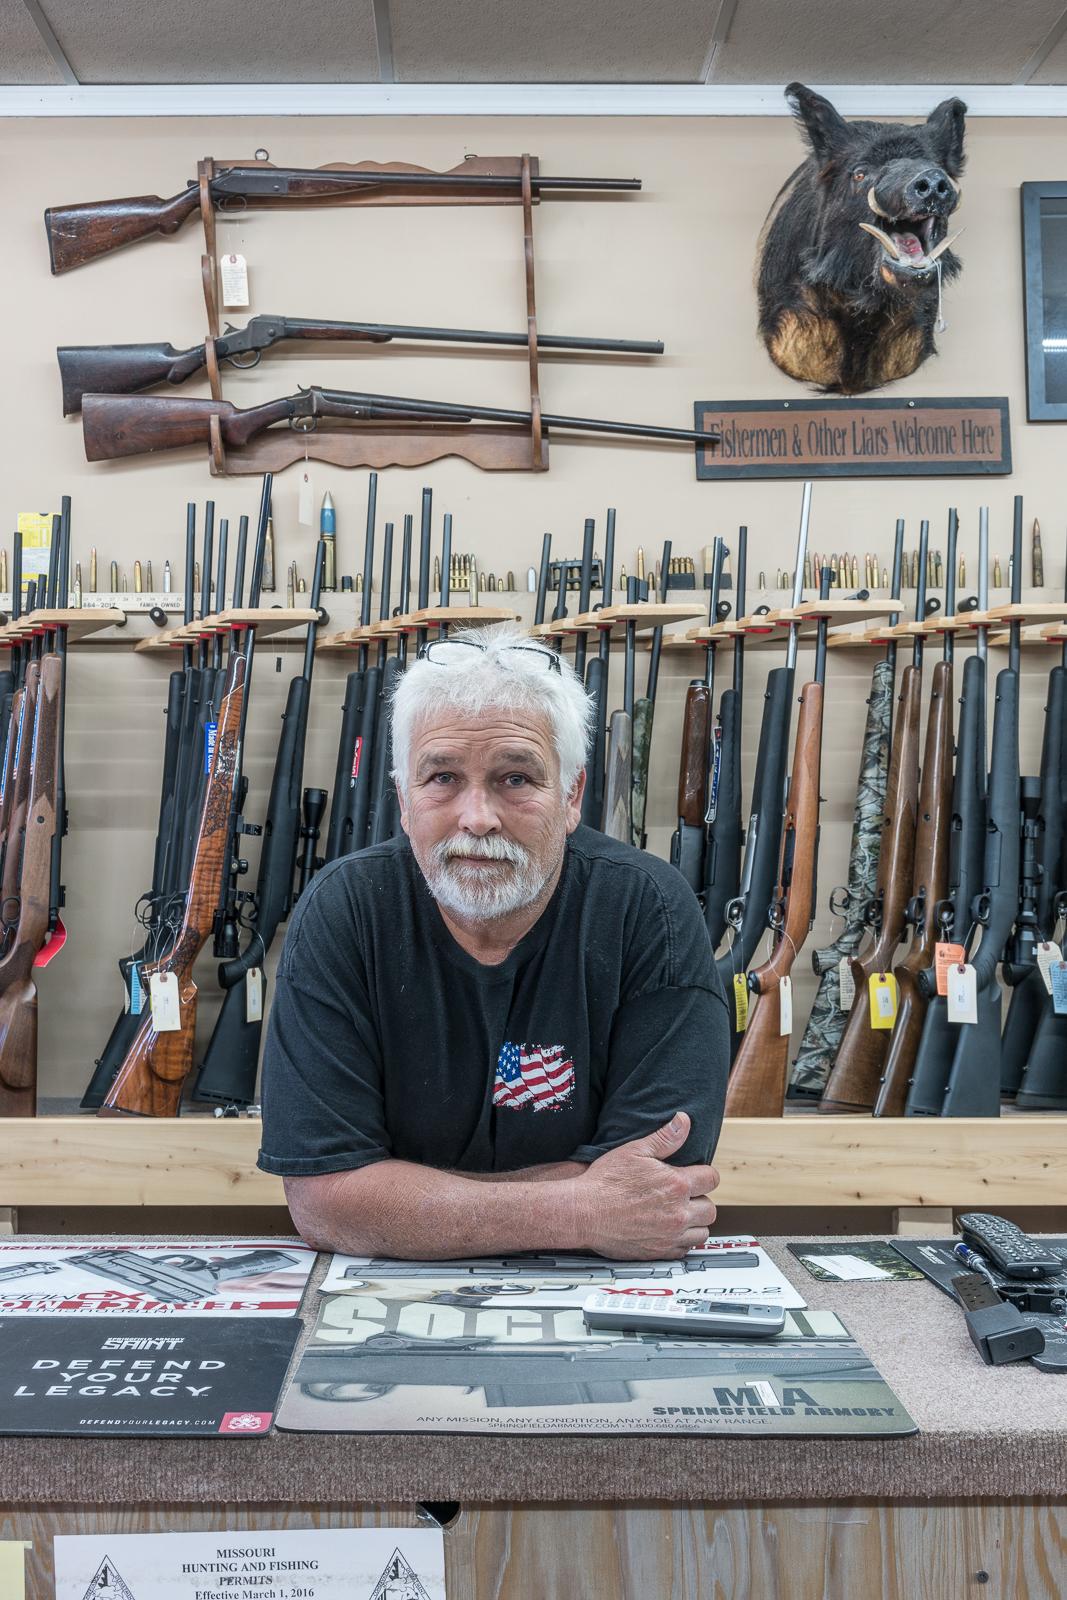 Clayton at the Gun Shop, De Soto, Missouri, 2017 © Nate Larson